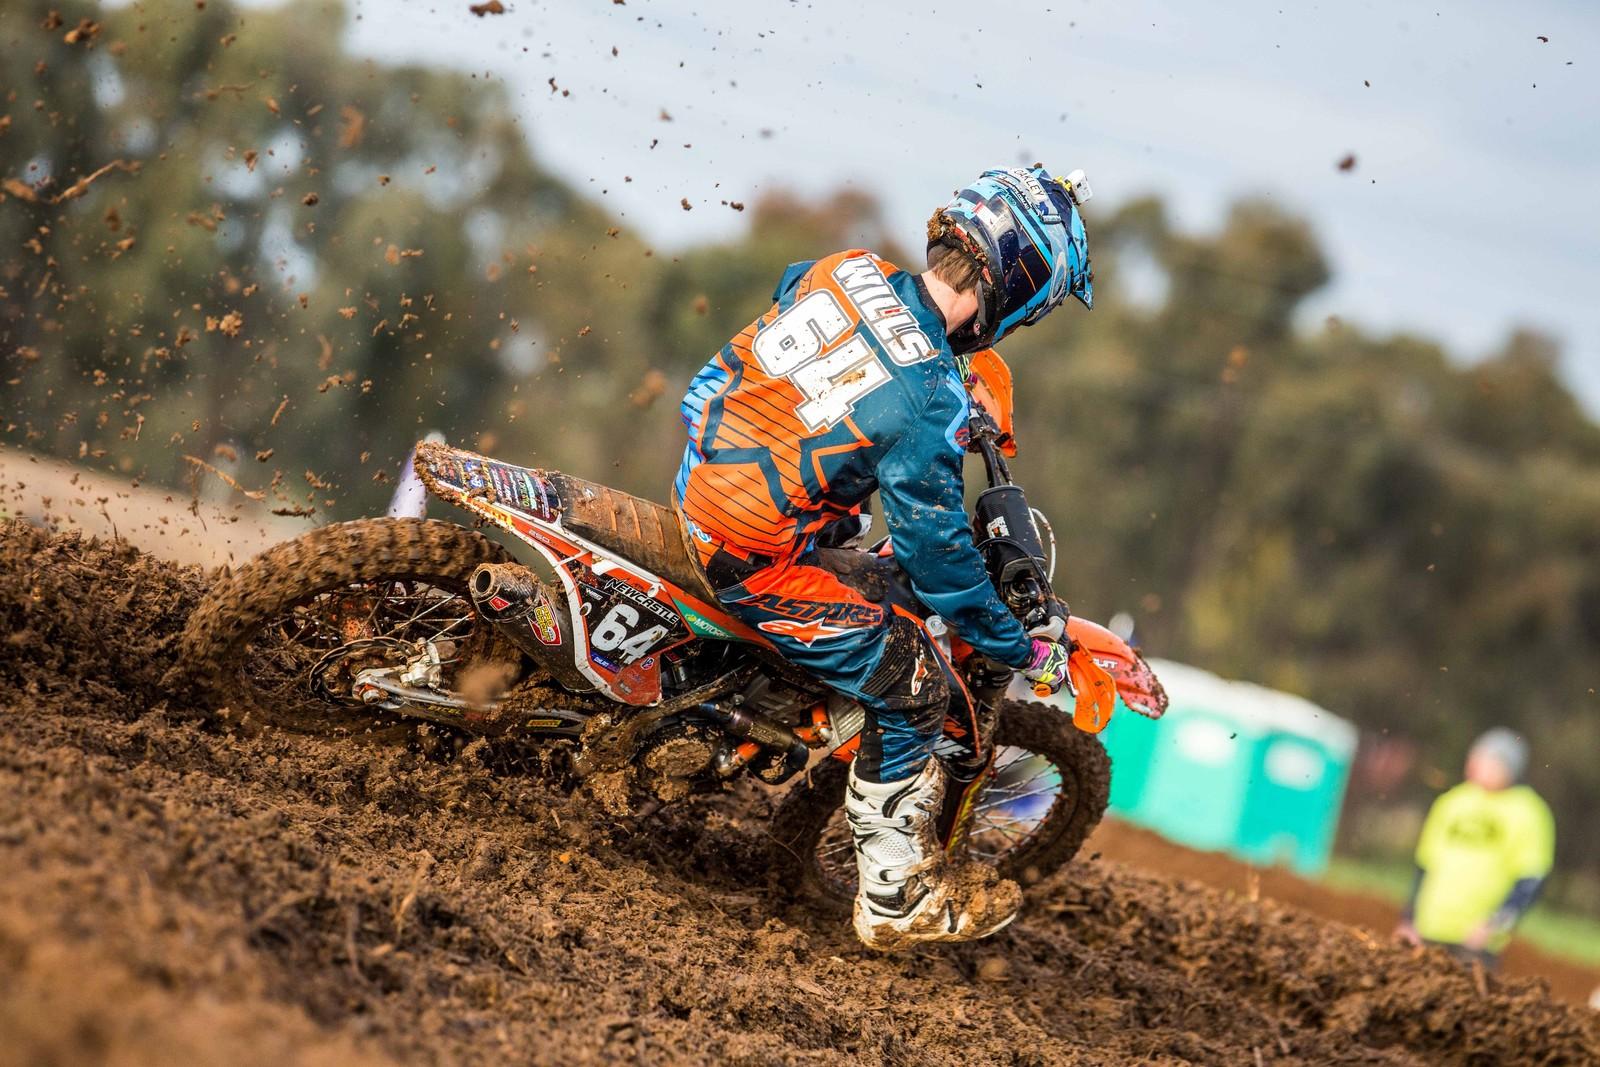 Dylan Wills - Australian Motul MX Championships: Round 8, Shepparton - Motocross Pictures - Vital MX